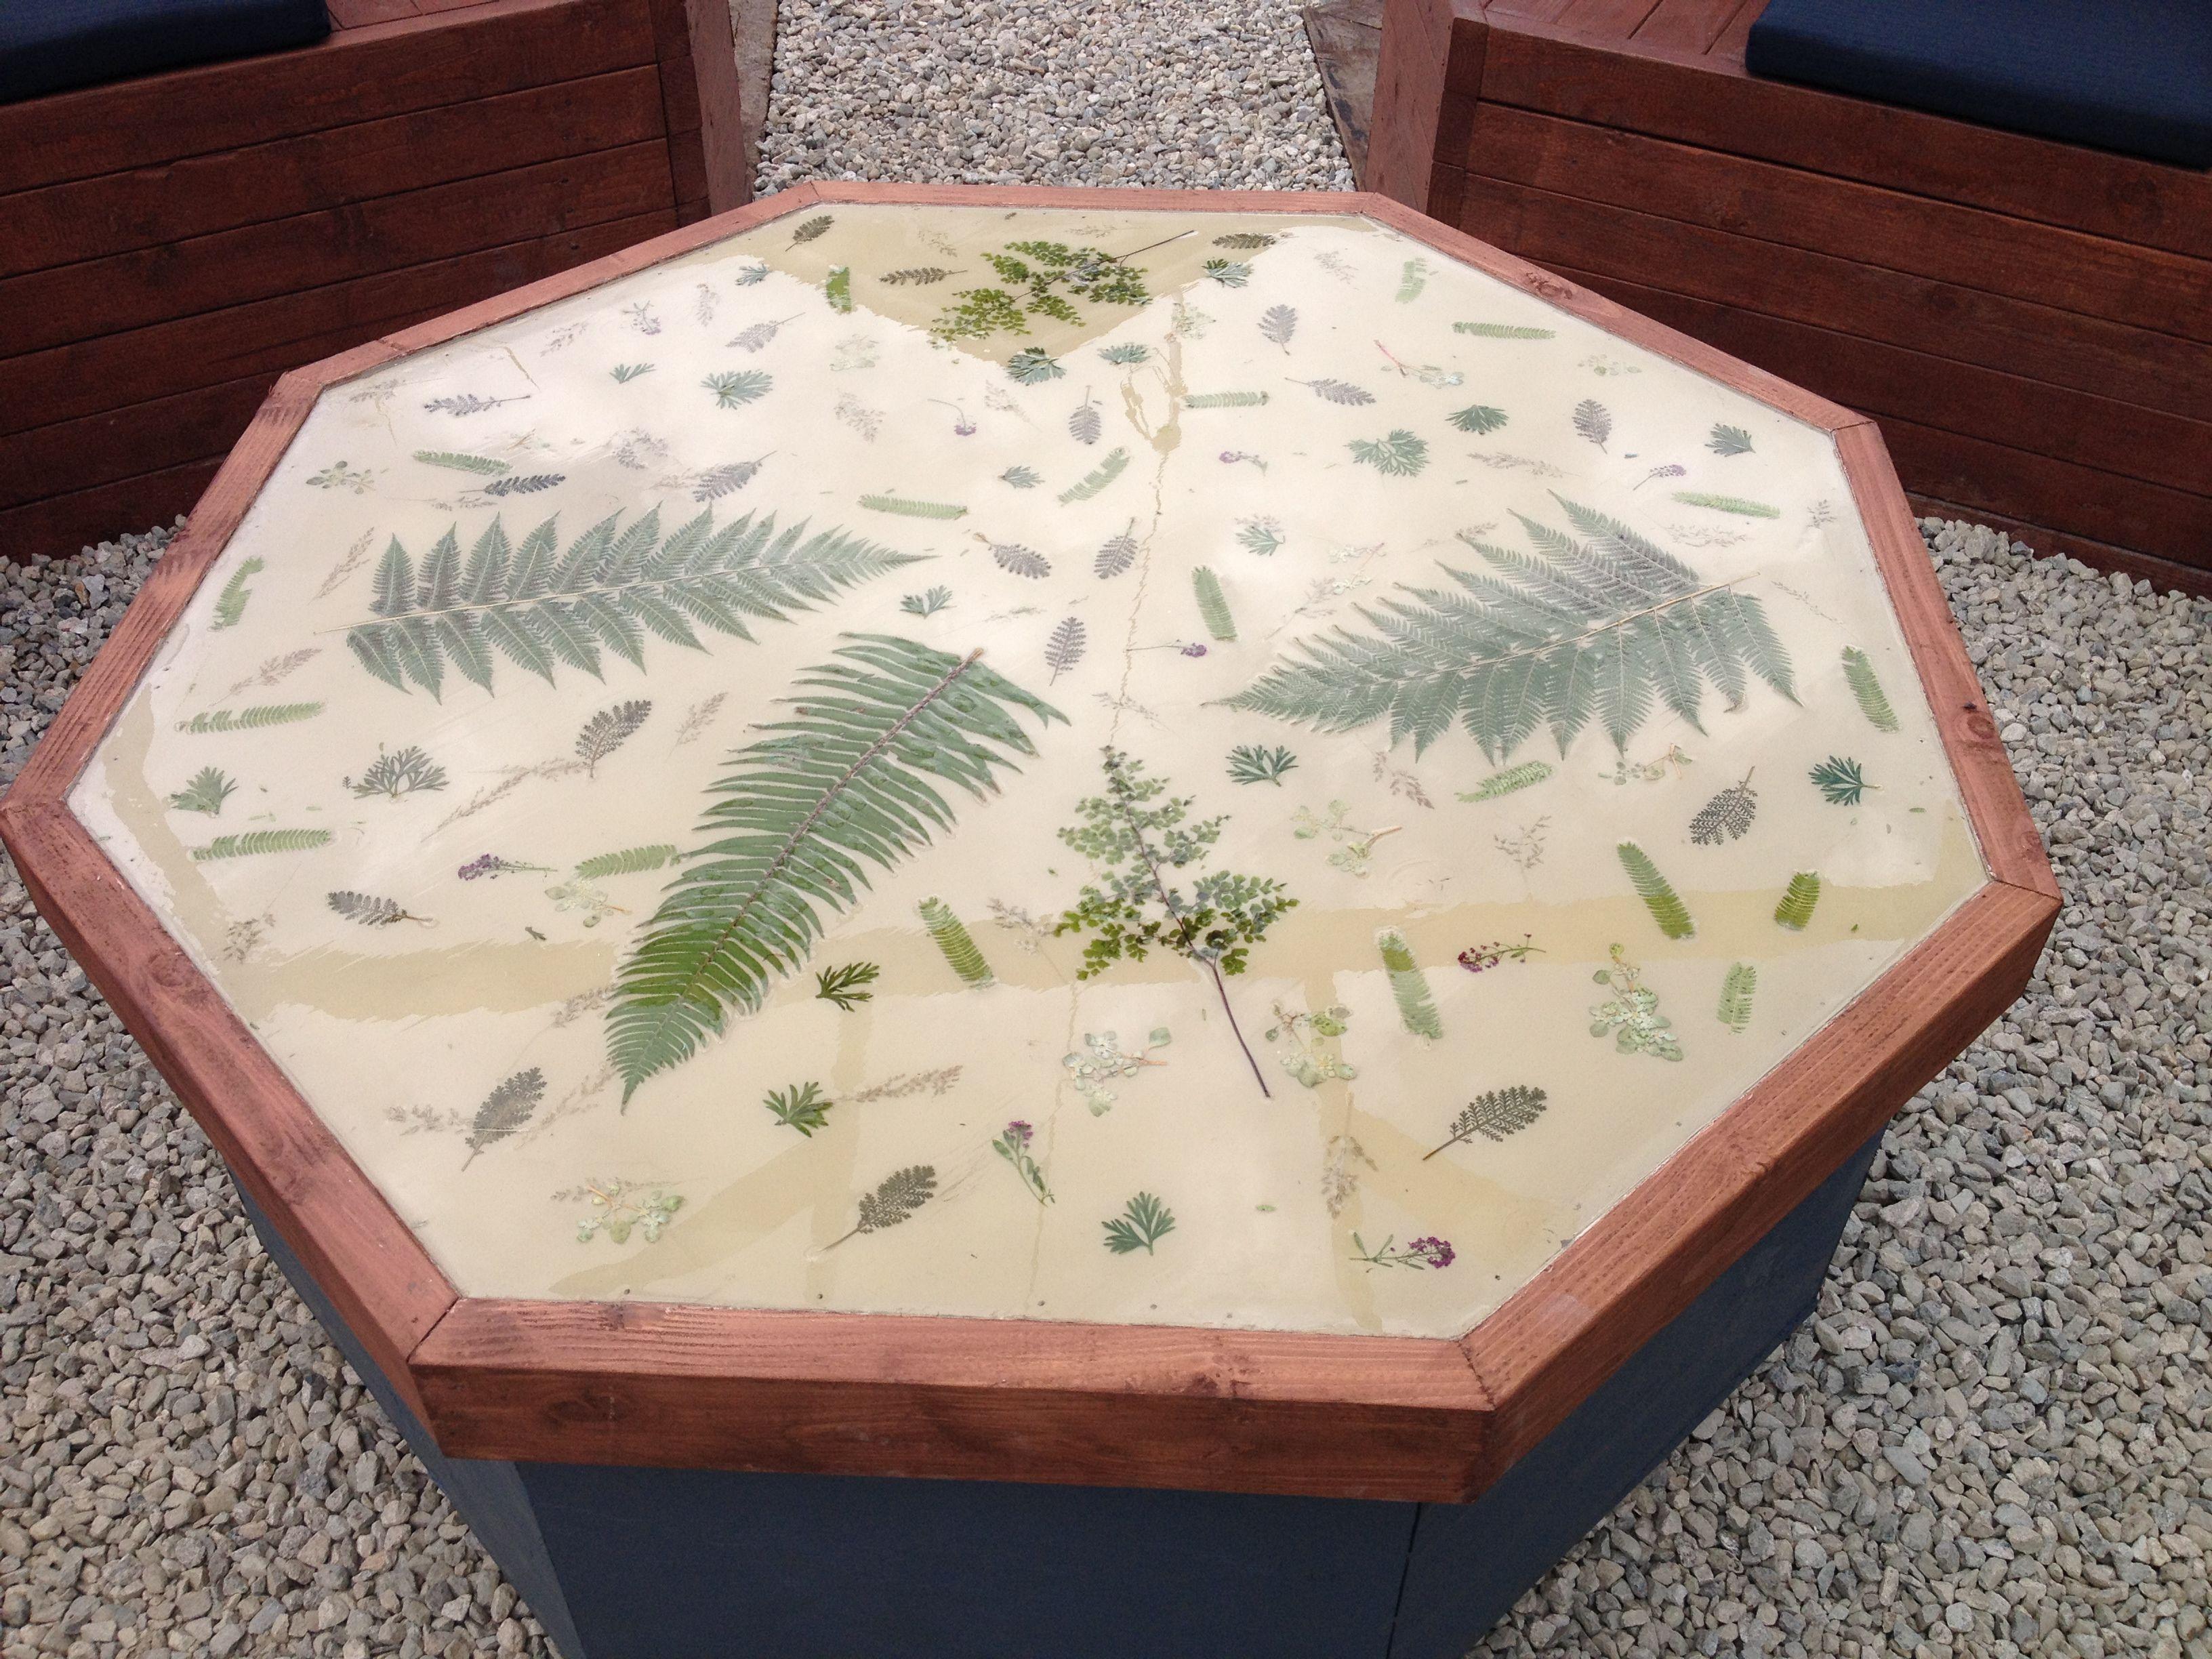 28+ Flowers in resin table ideas